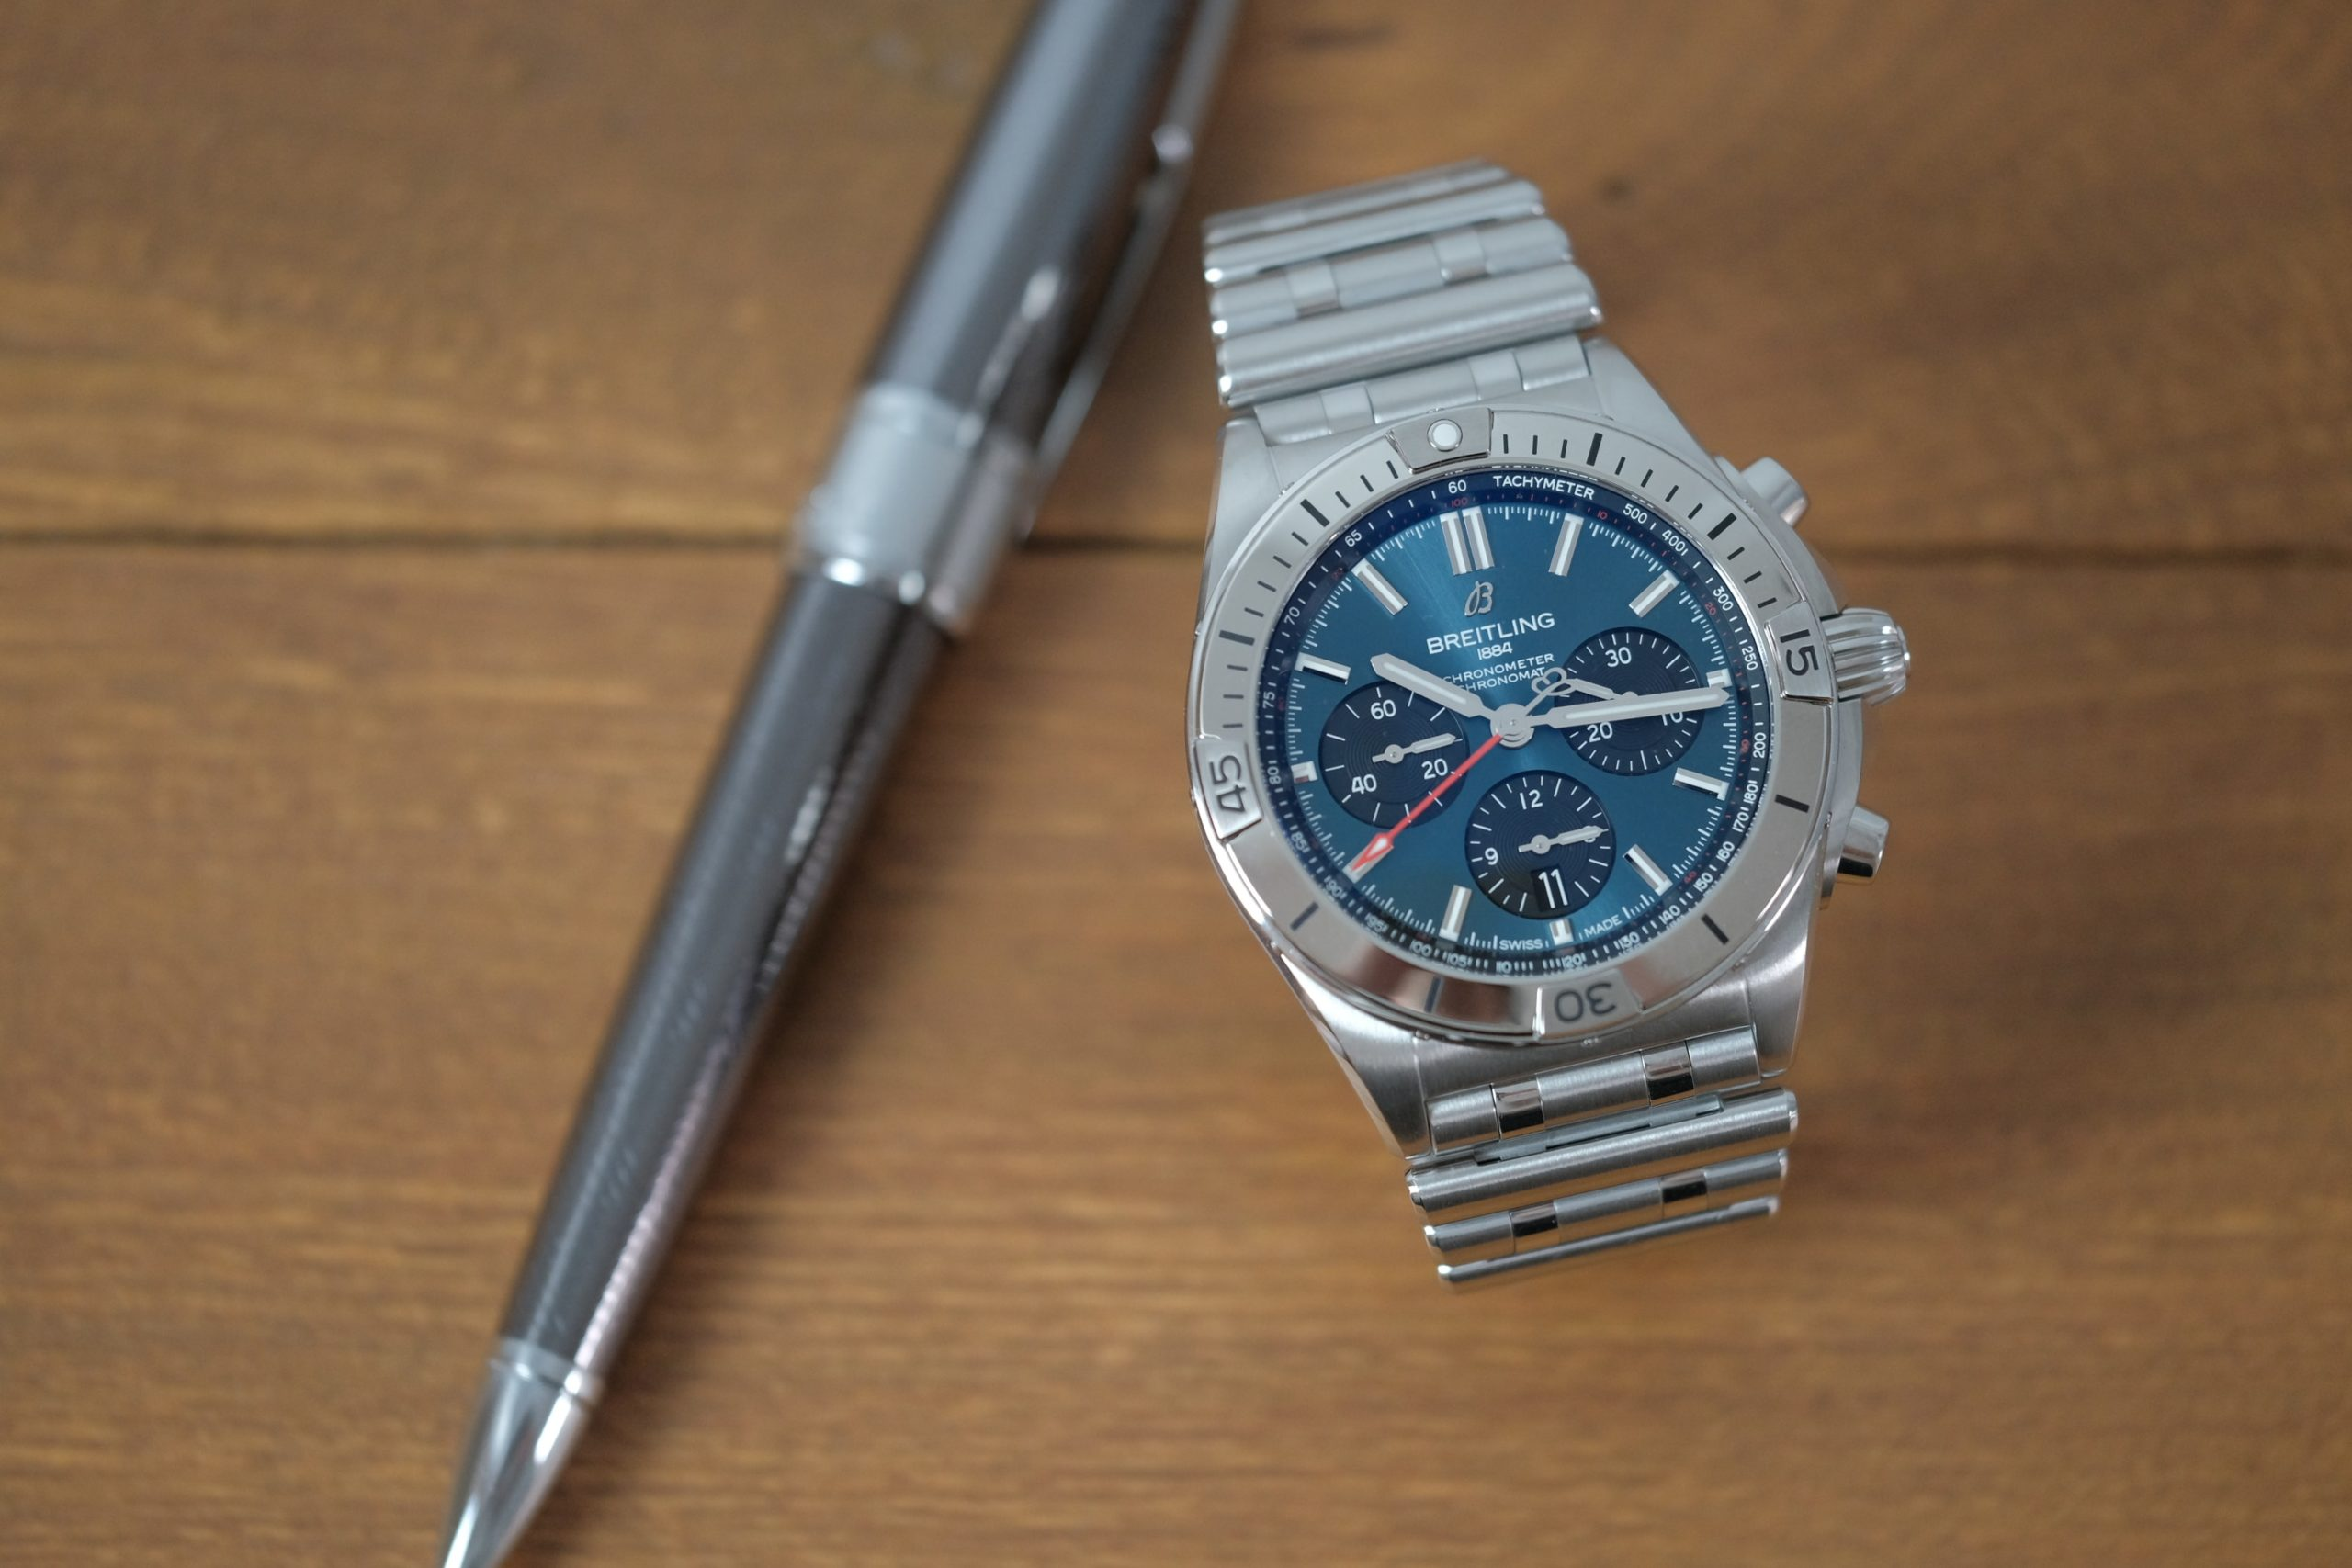 Breitling Chronomat B01 42 Watch Review - WatchReviewBlog